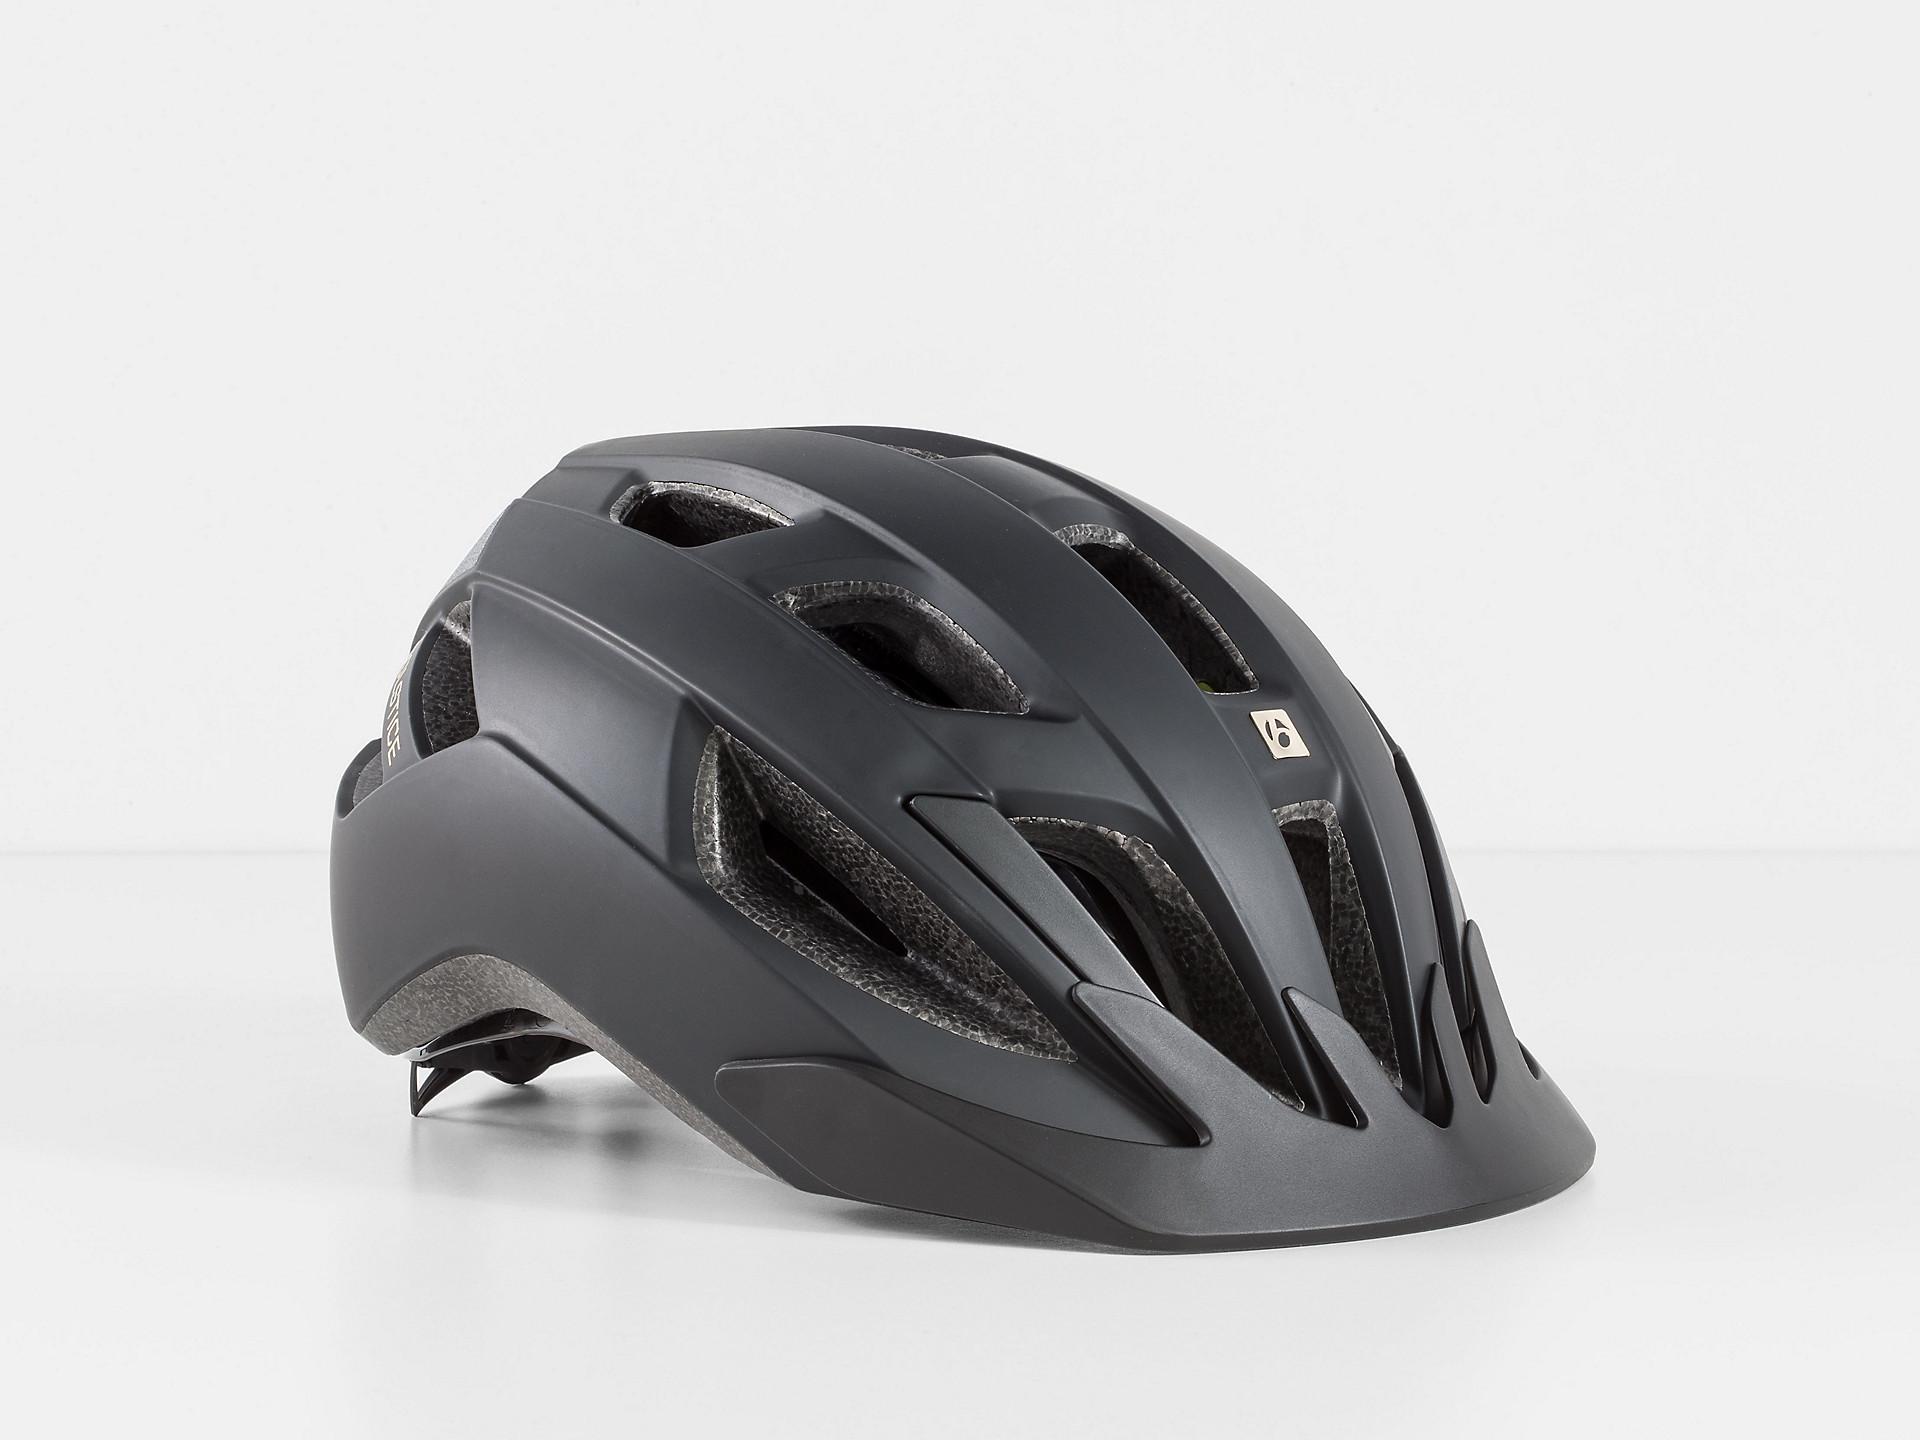 Cykelhjelme | Trek Bikes (DK)